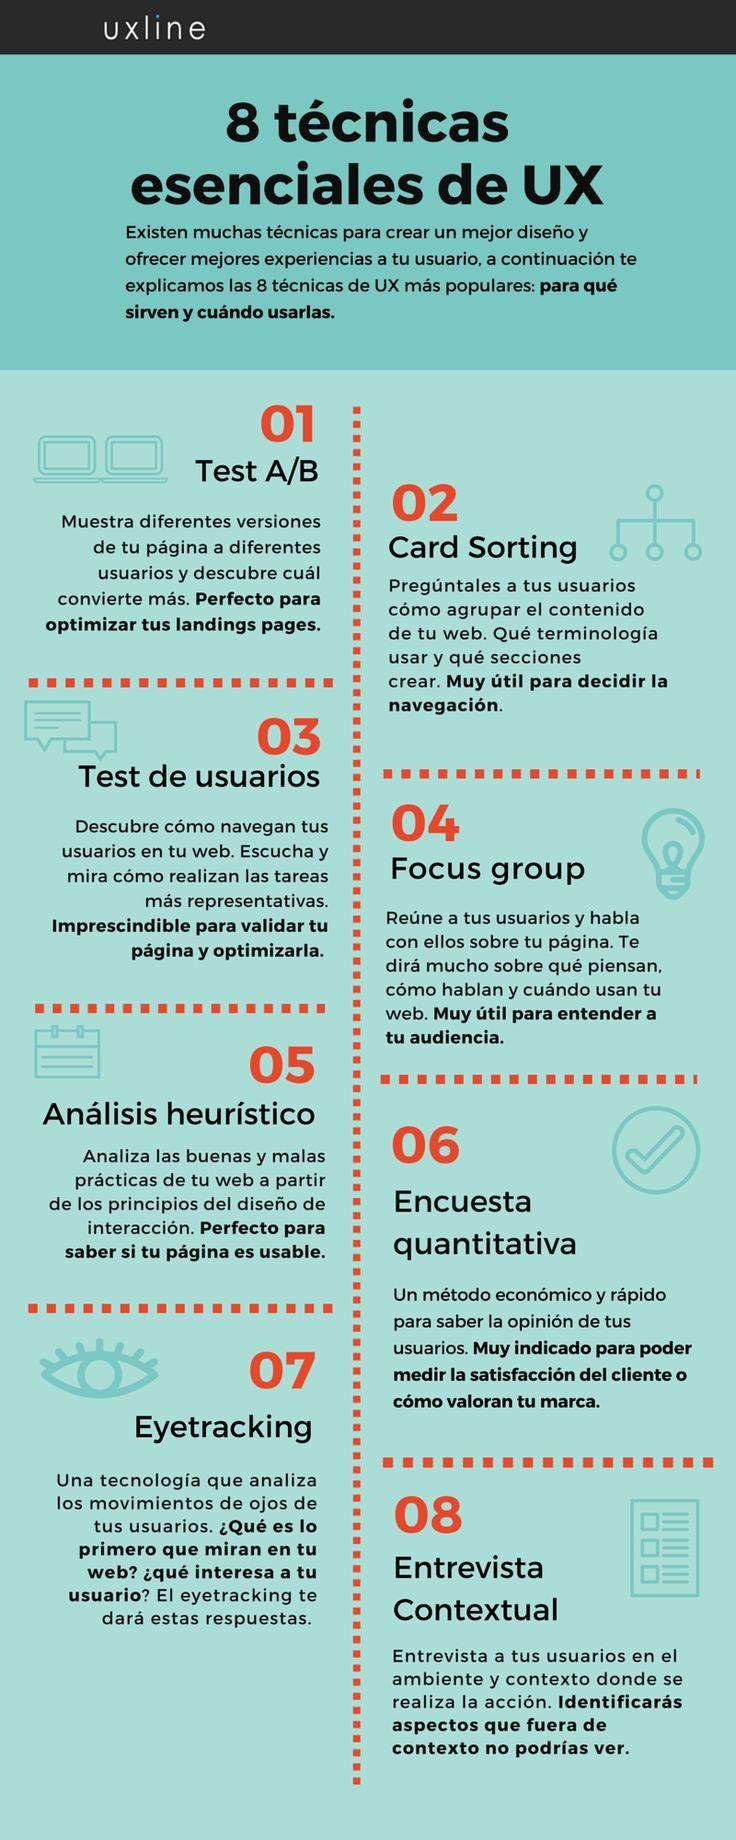 8 técnicas esenciales de UX (experiencia de usuario) #infografia #infographic #marketing